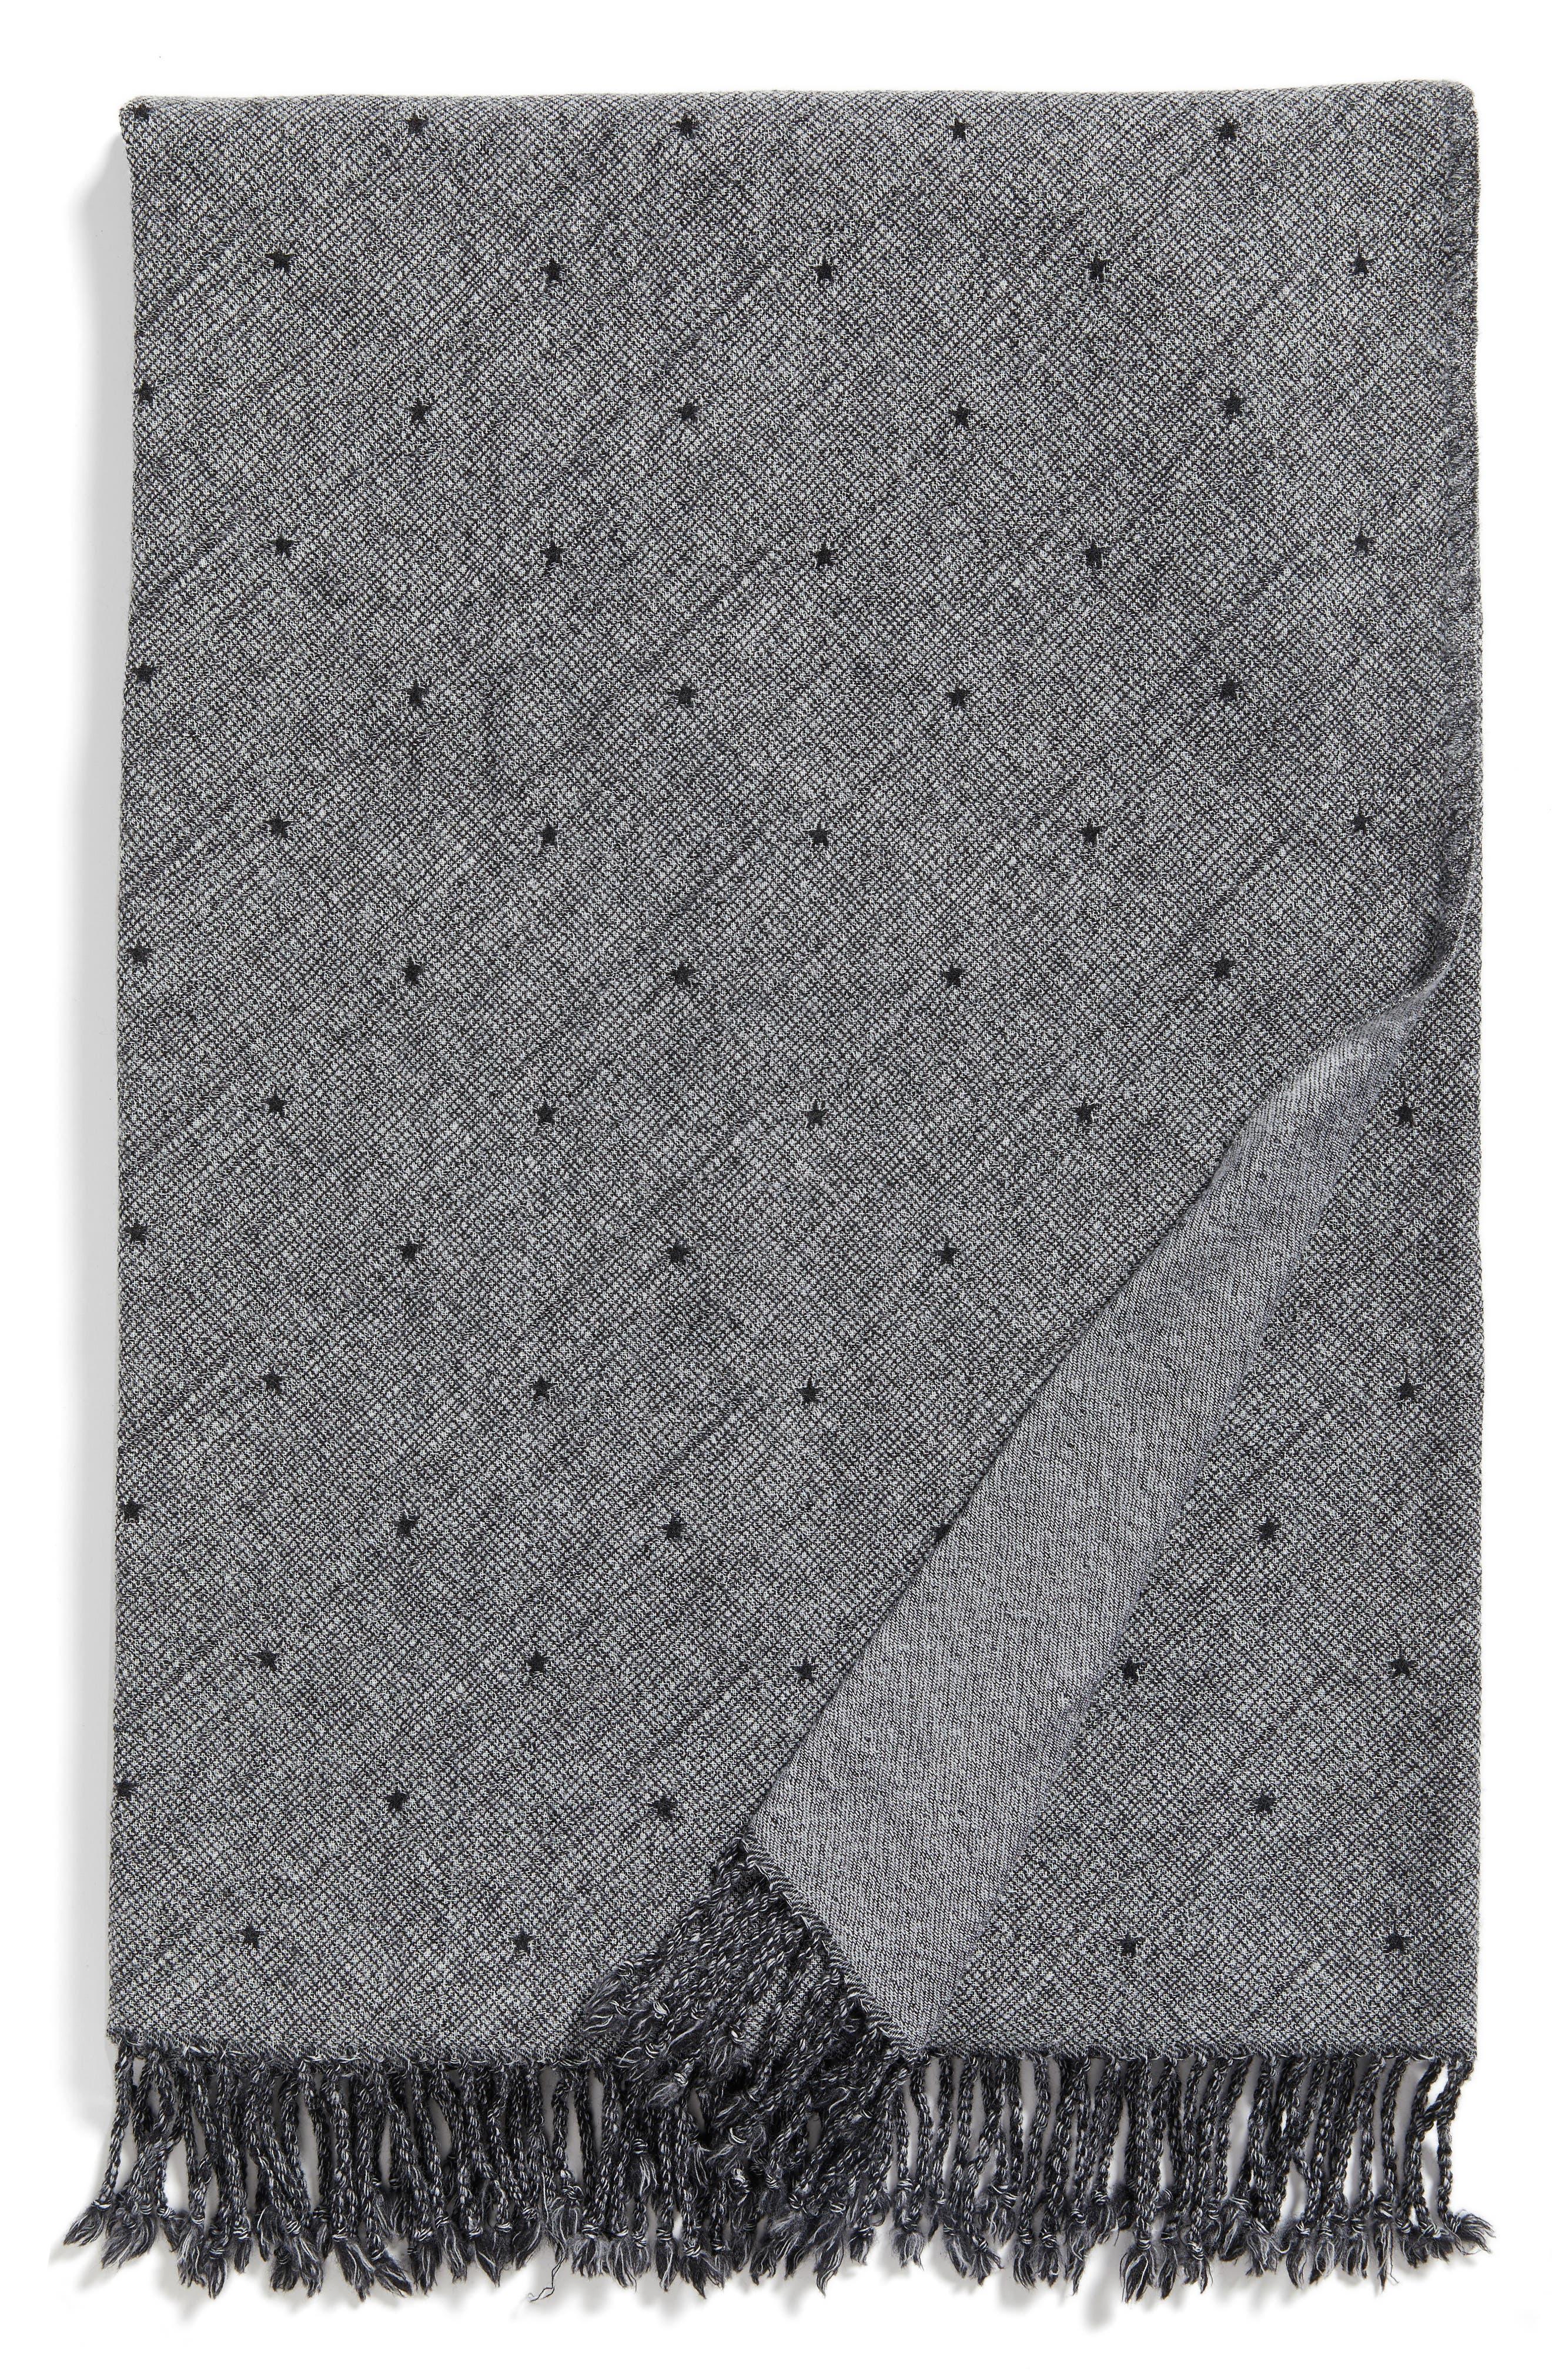 Modern Staples Blackstar Double Face Merino Wool Throw